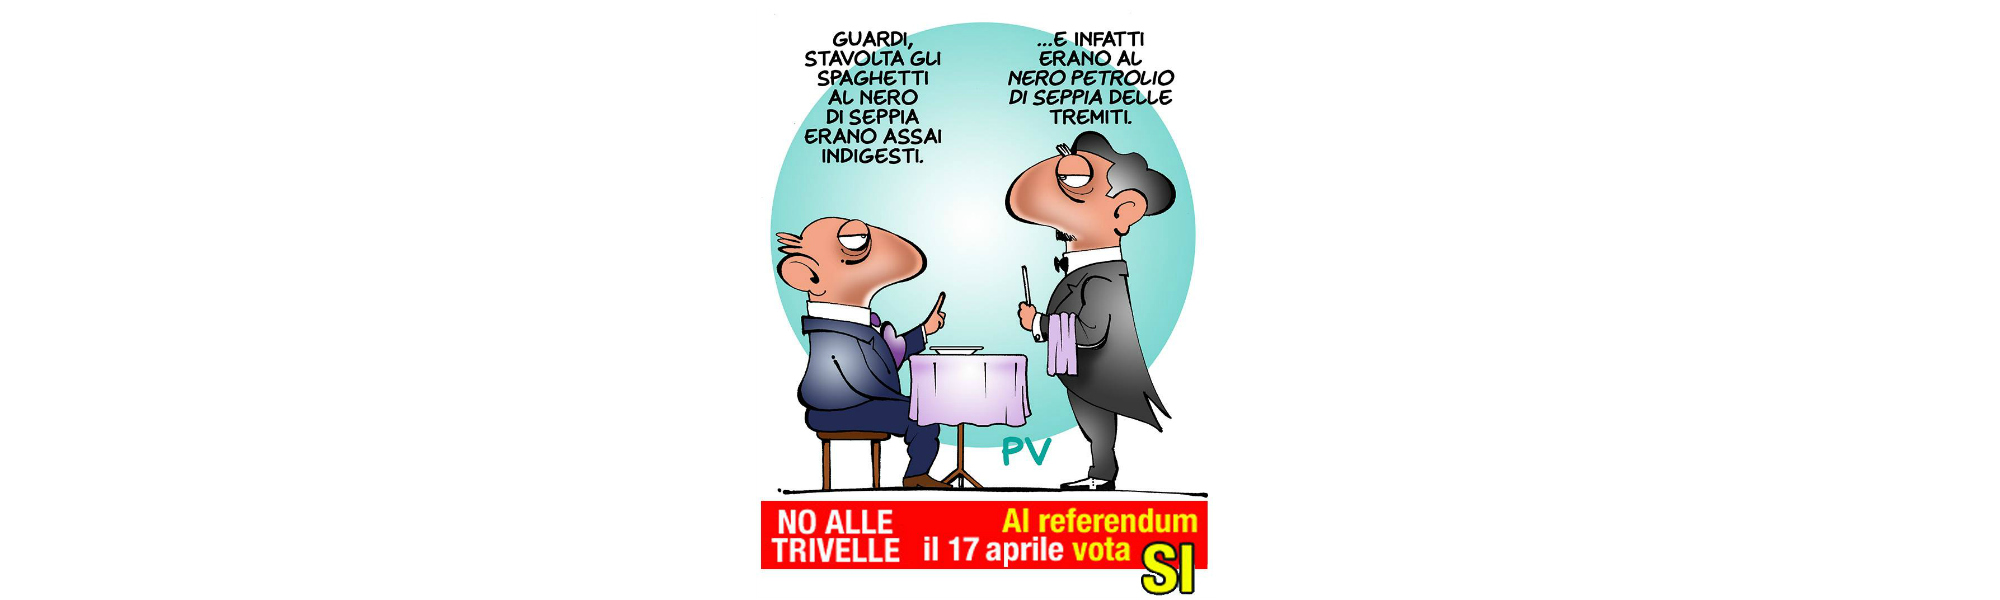 17 Aprile Referendum Trivelle. Questo misconosciuto Vignetta di Pietro Vanessi